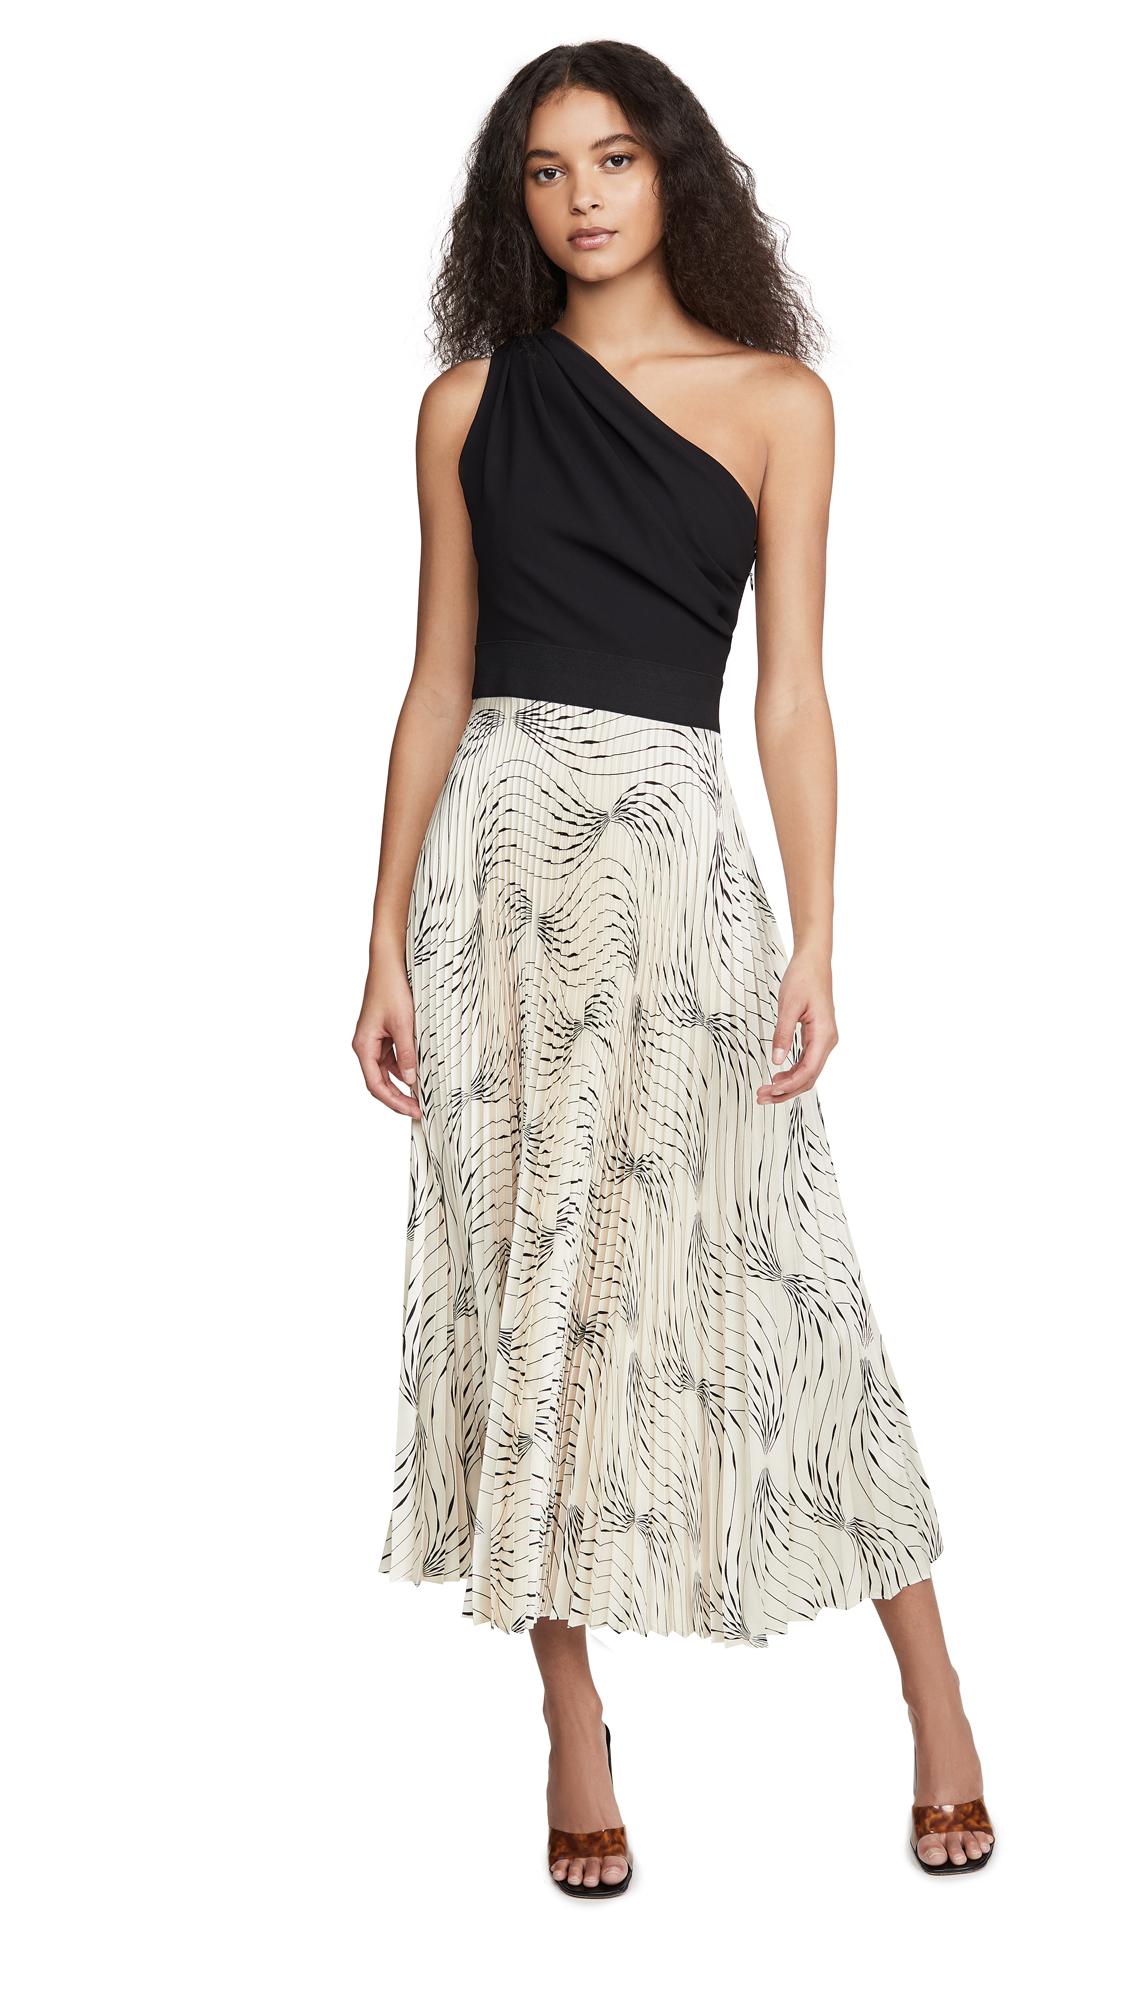 Buy Victoria Victoria Beckham Off Shoulder Backless Dress online beautiful Victoria Victoria Beckham Clothing, Dresses